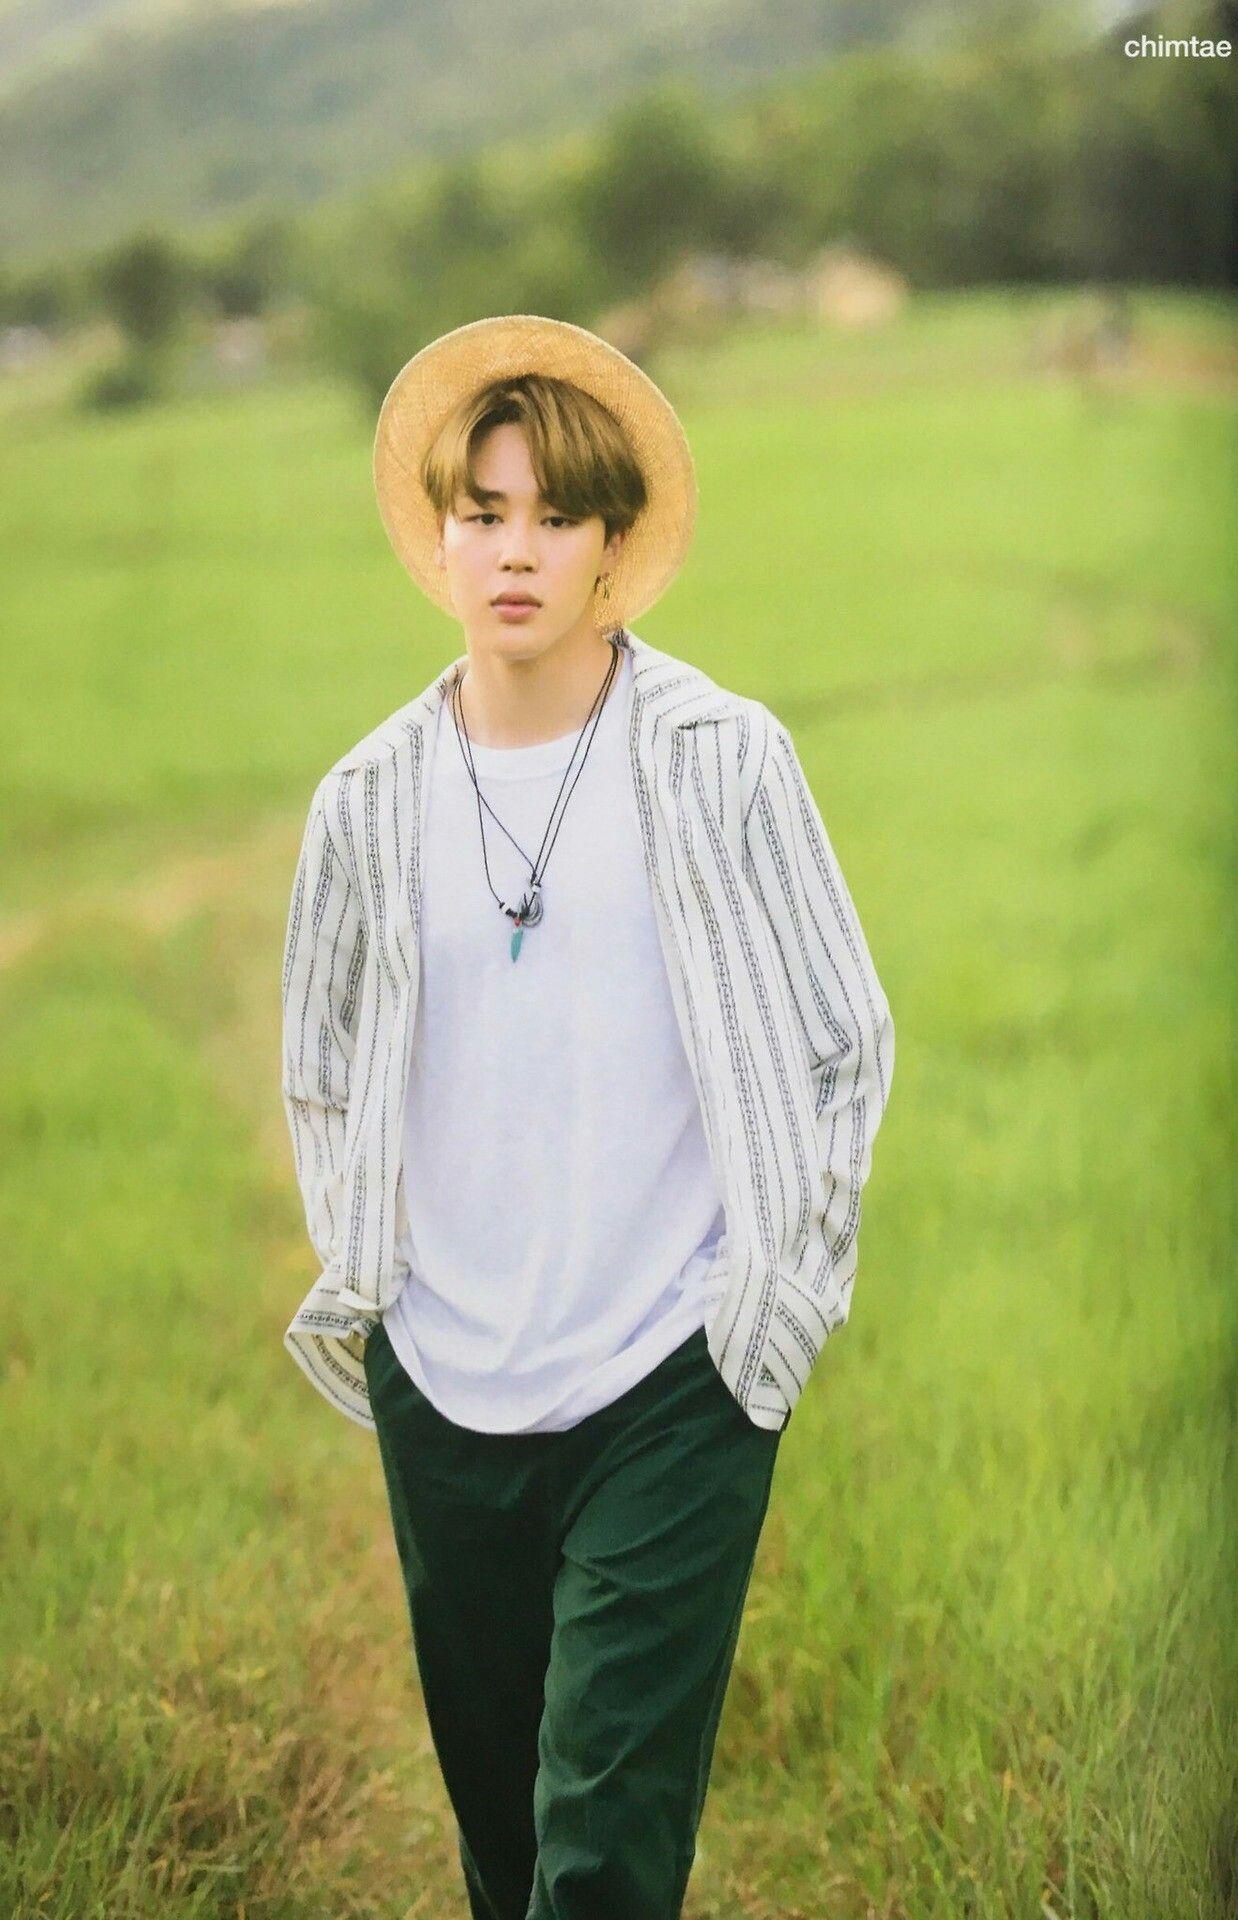 foto de Jimin ~ BTS Summer Package 2017 BTS (방탄소년단) Pinterest